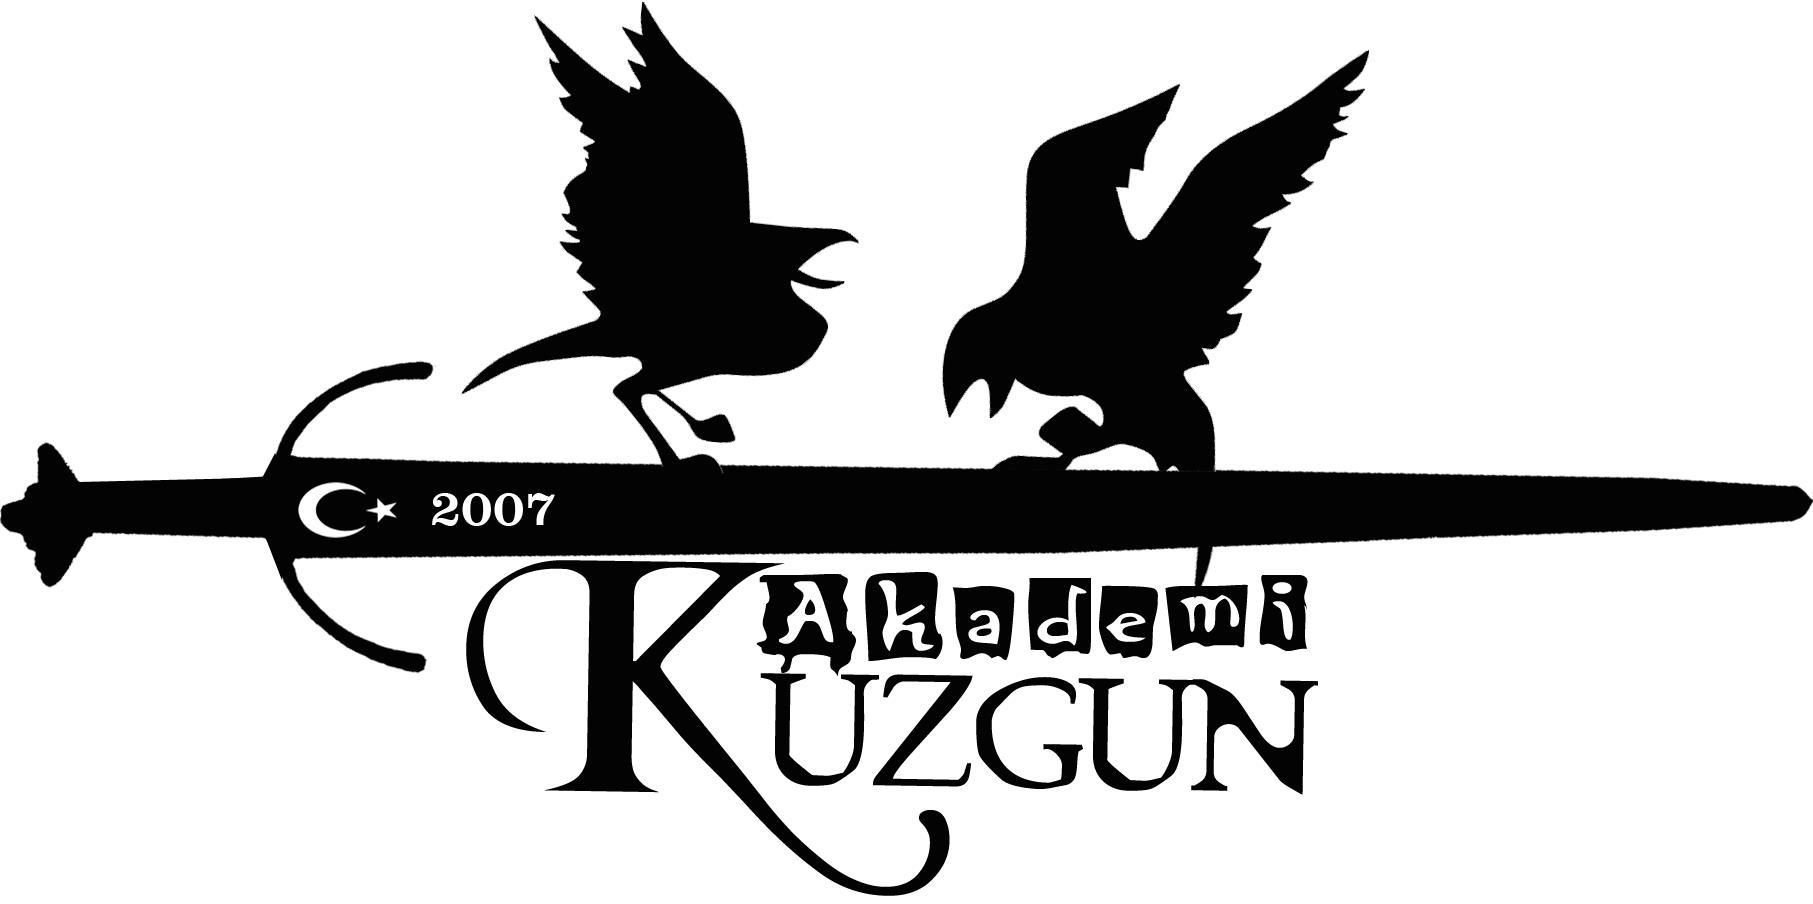 kuzgun-akademi-logo